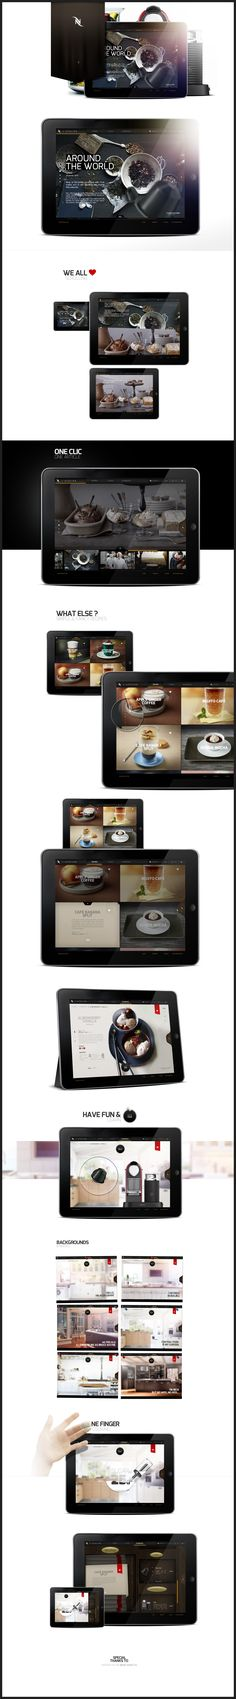 Nespresso workshop app design by Antoine Pelgrand Kostadinoff